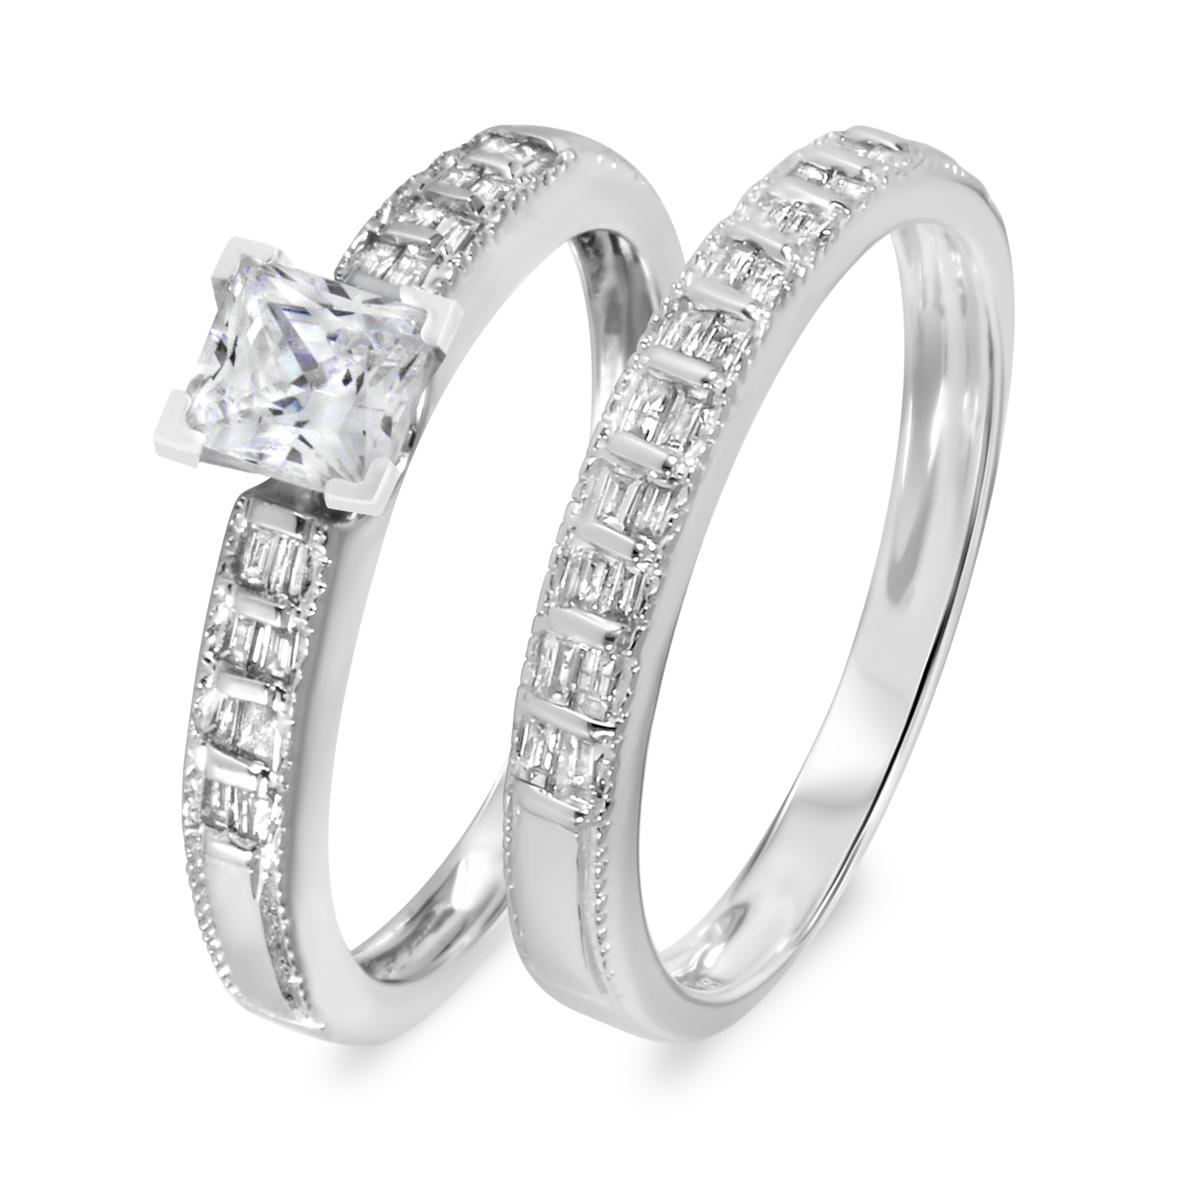 1 1/10 CT. T.W. Diamond Women's Bridal Wedding Ring Set 14K White Gold